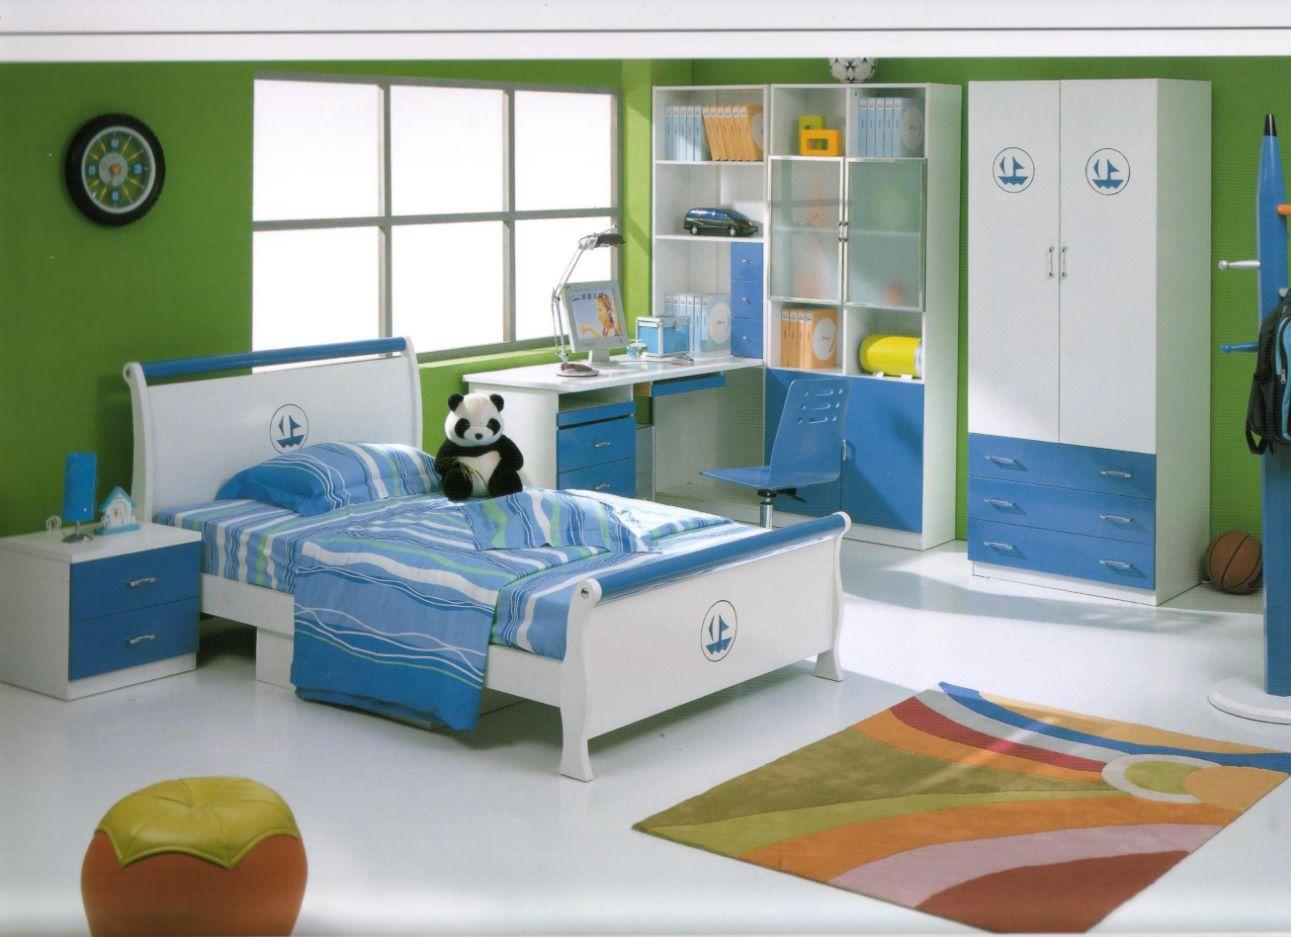 cuarto-dormitorio-habitacion-para-nino-o-nina